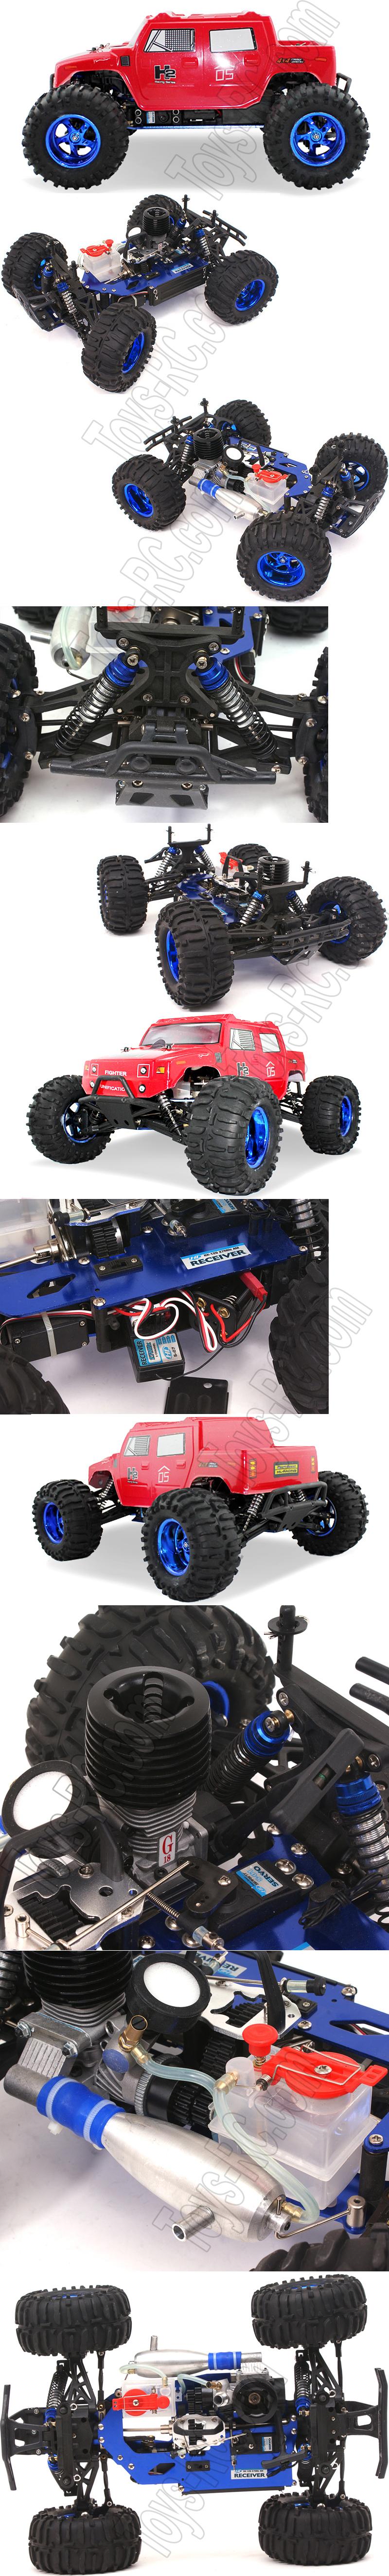 Hummer car toys  HengLong  Triumph Hummer WD CXP Engine Nitro RC Truck